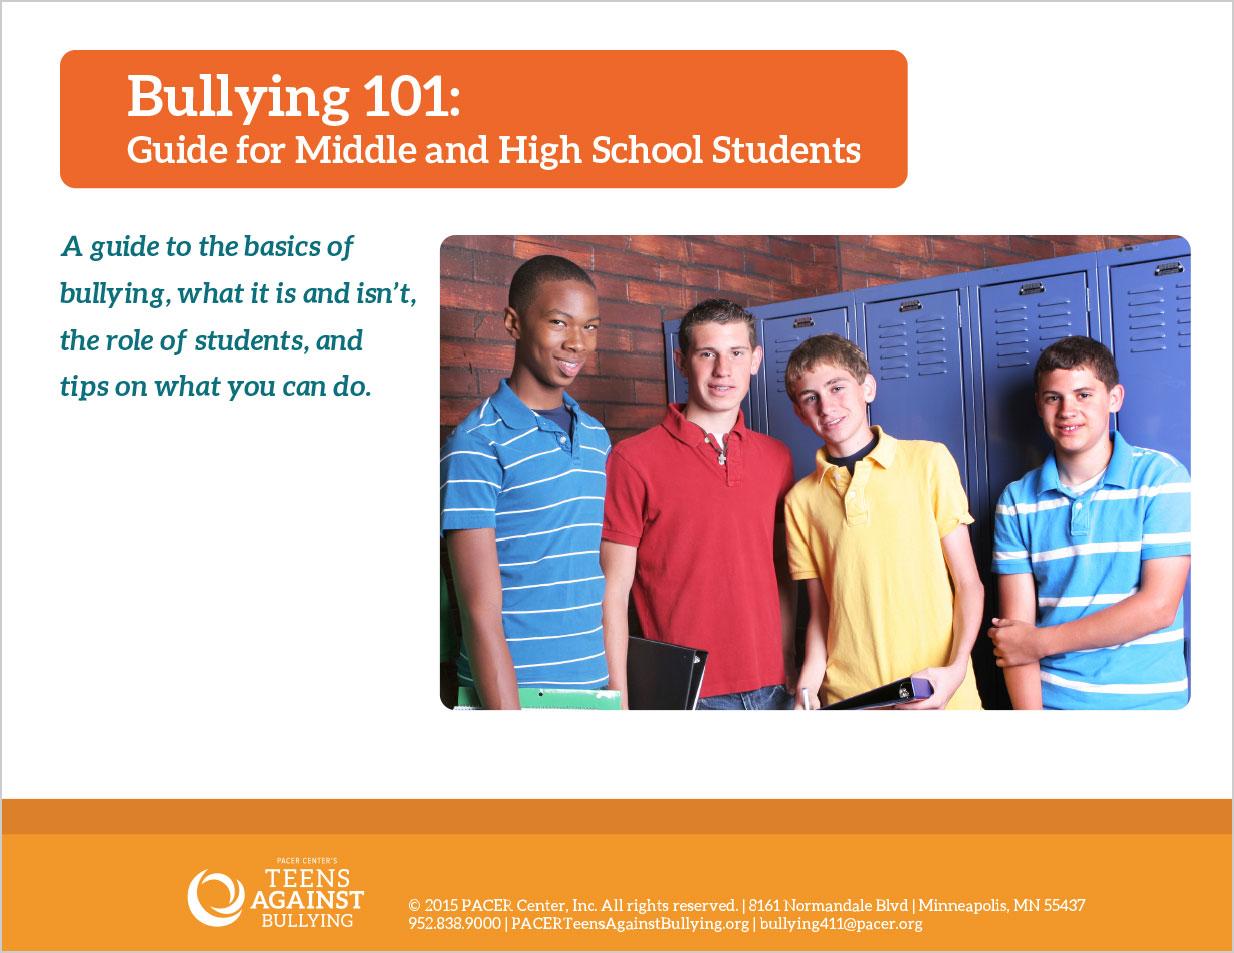 bullying 101 presentation